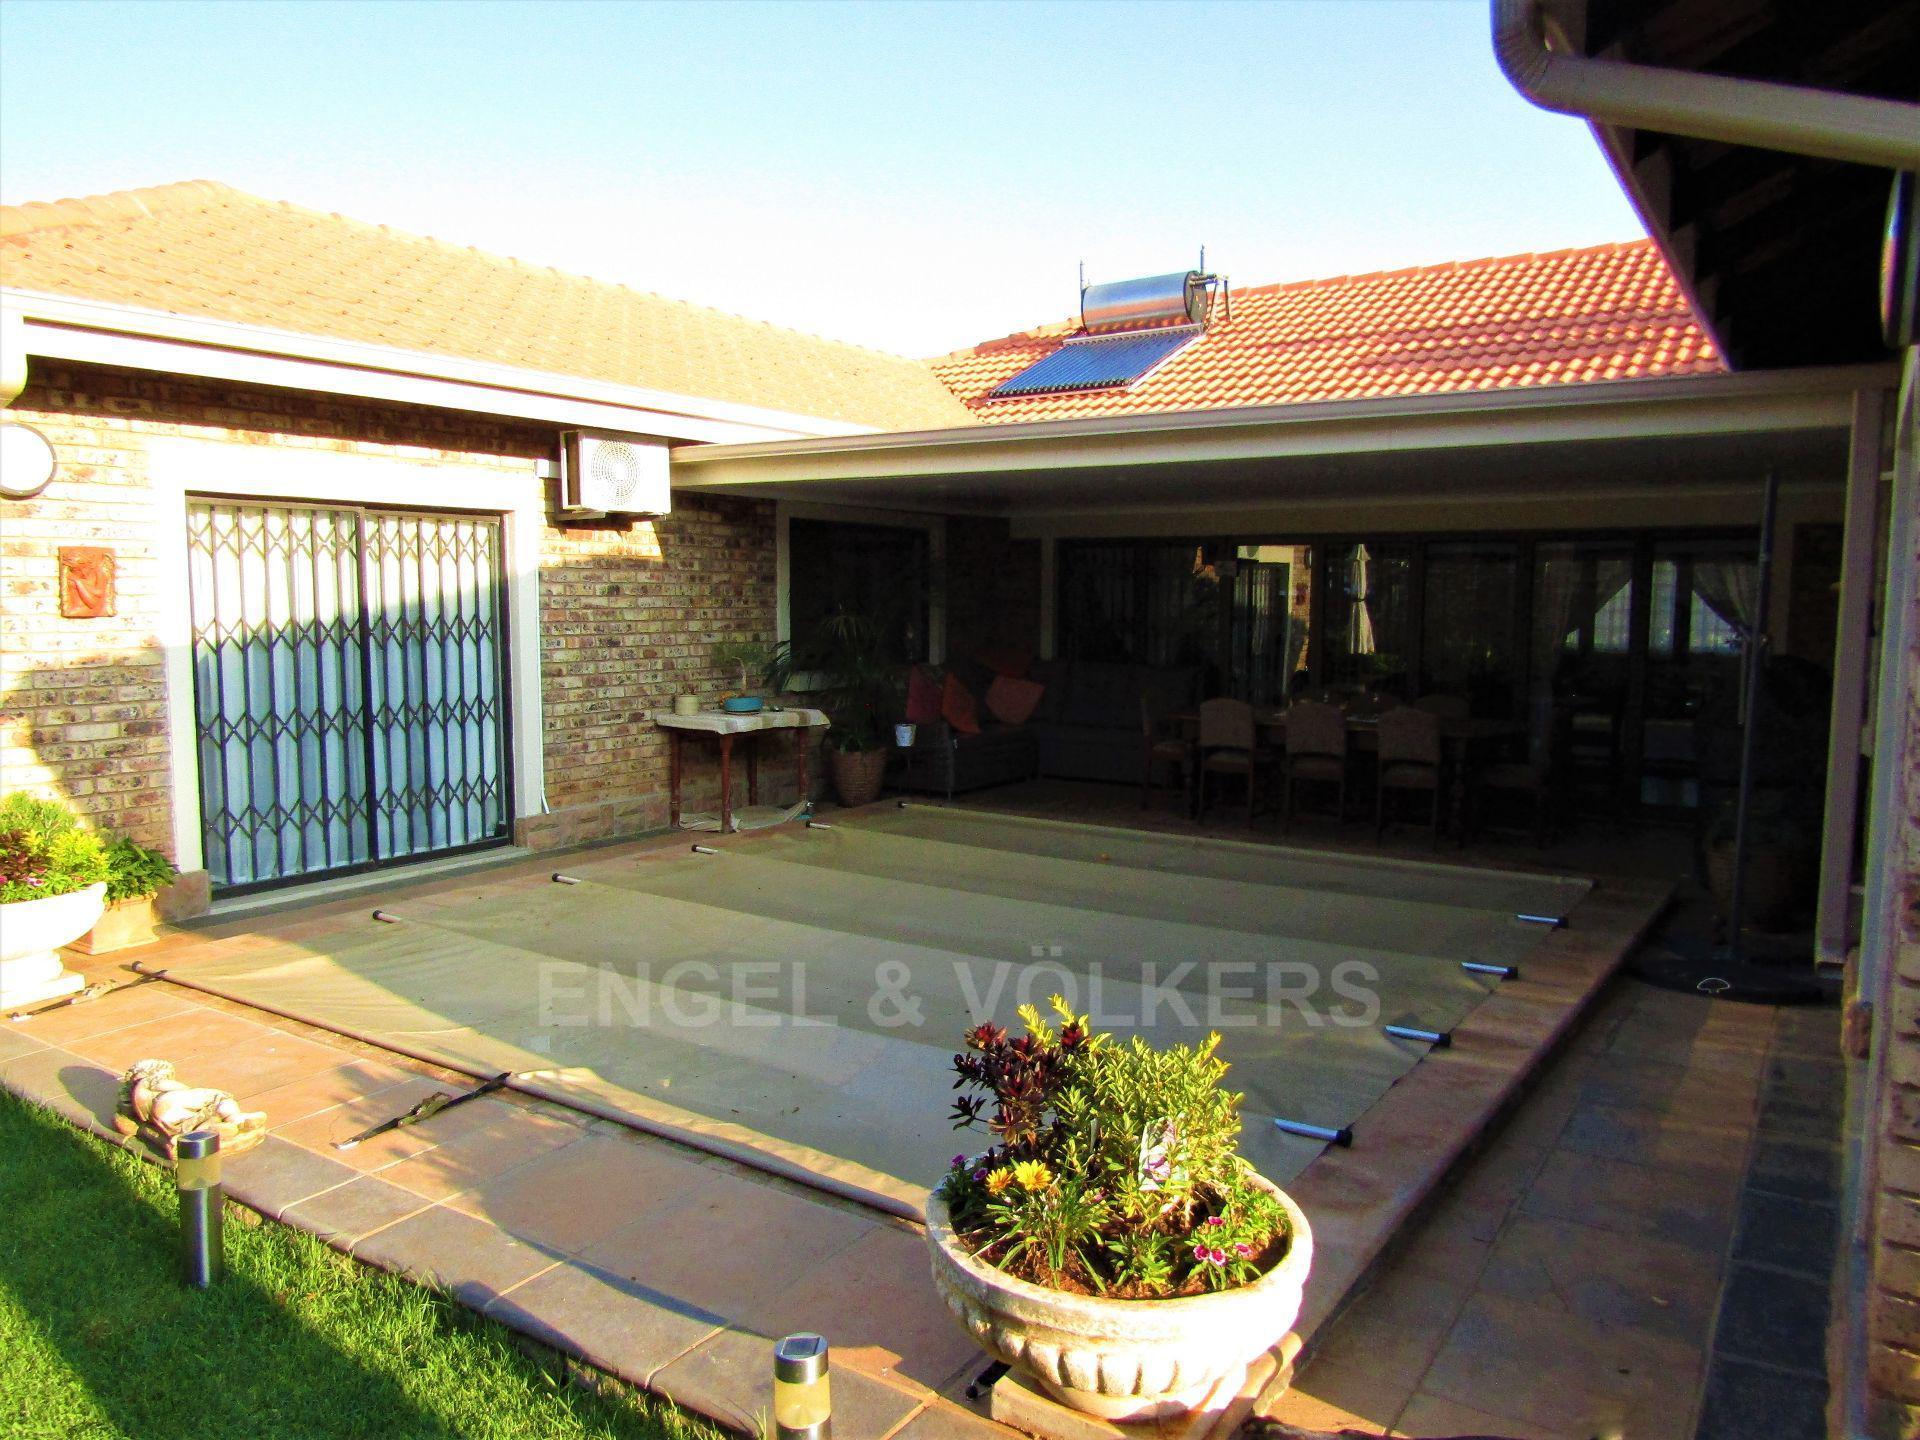 Lifestyle Estate property for sale. Ref No: 13458759. Picture no 24